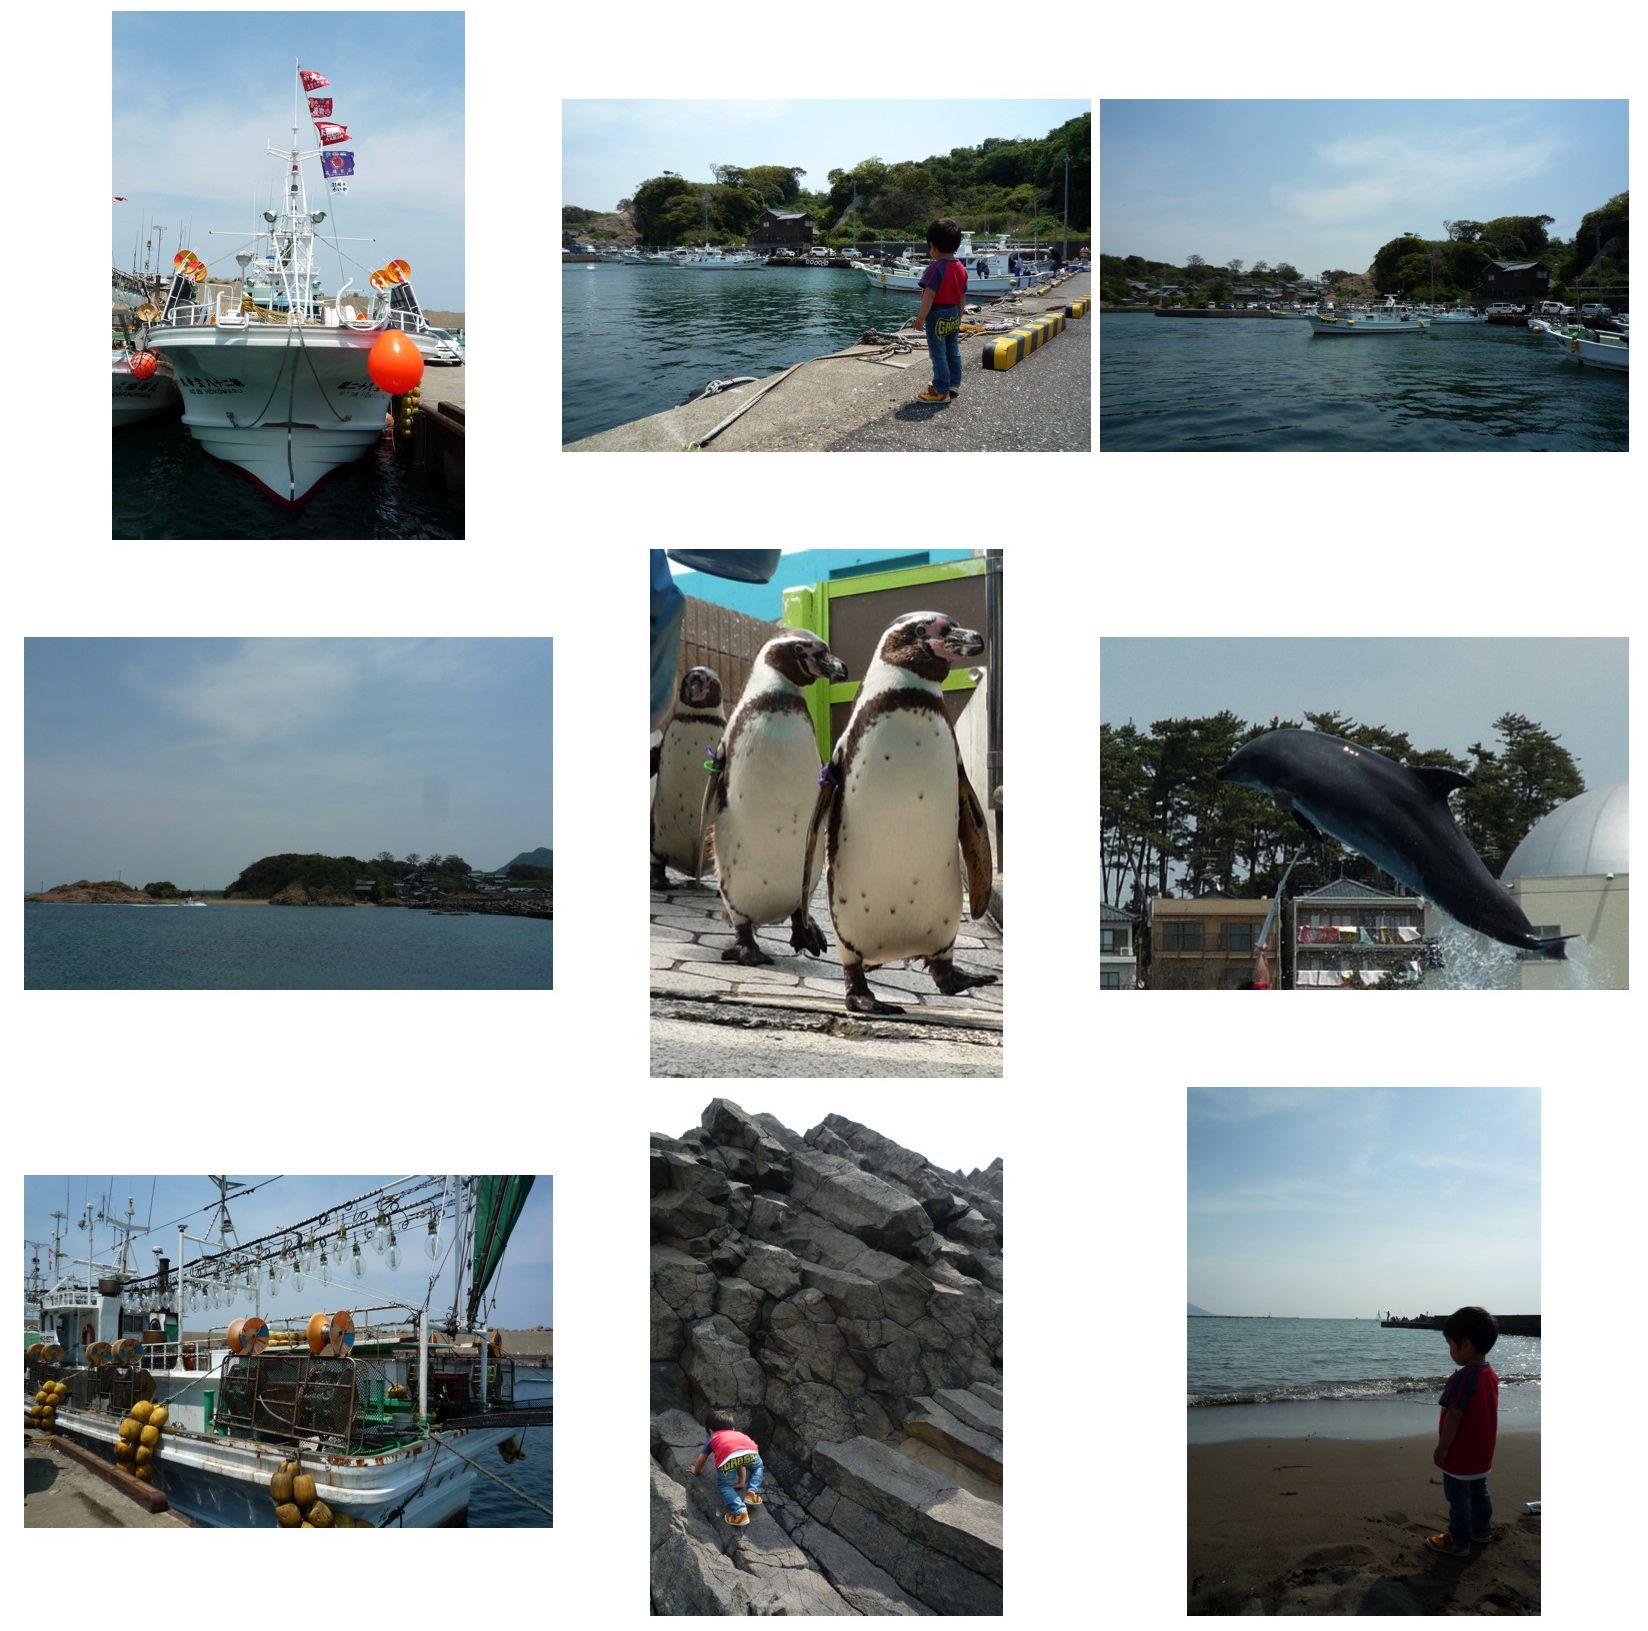 日本海満喫ツアー | miaaa旅行_f0165030_10341169.jpg